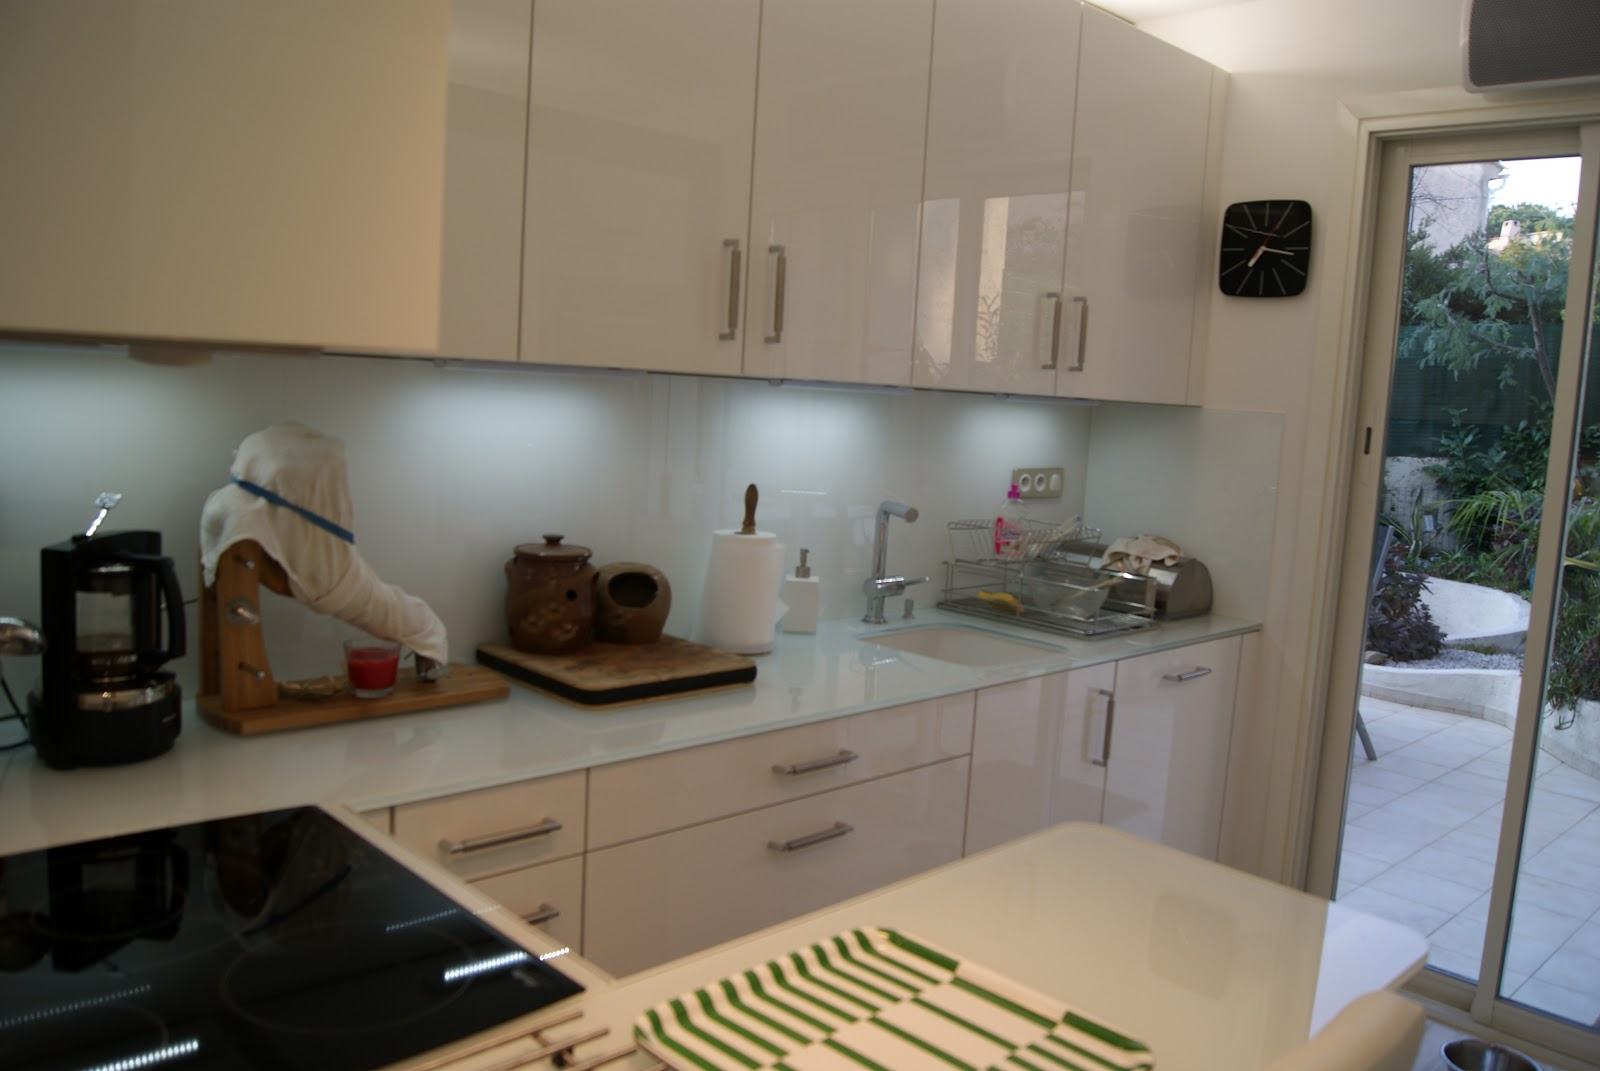 Architecture travaux cabinet donati nouvelle cuisine for Cuisine laquee blanche